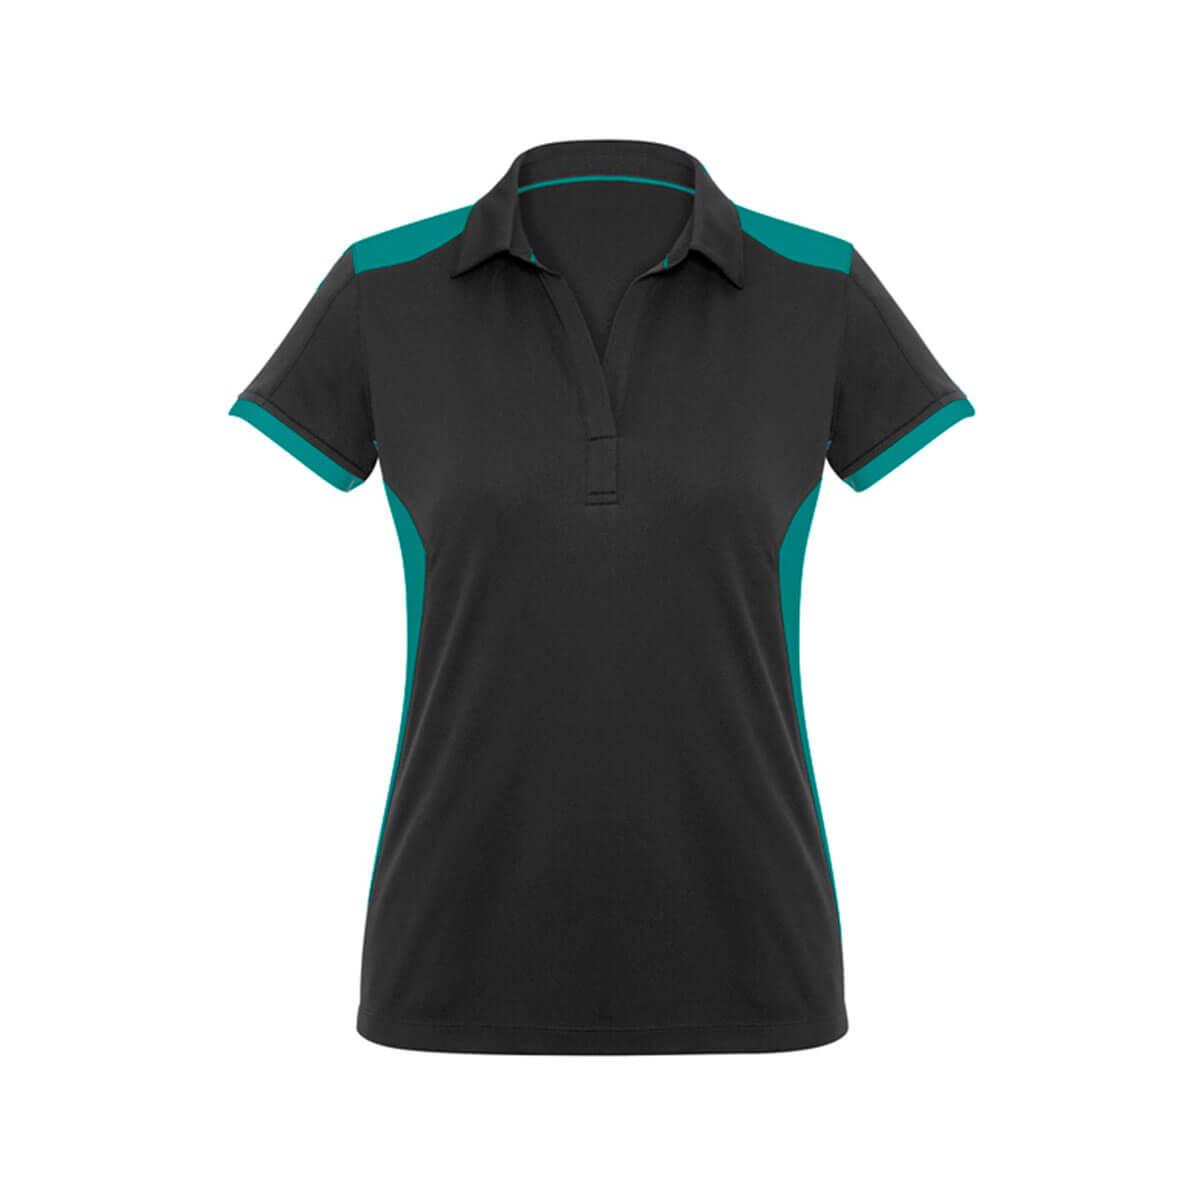 Ladies Rival Polo-Black / Teal